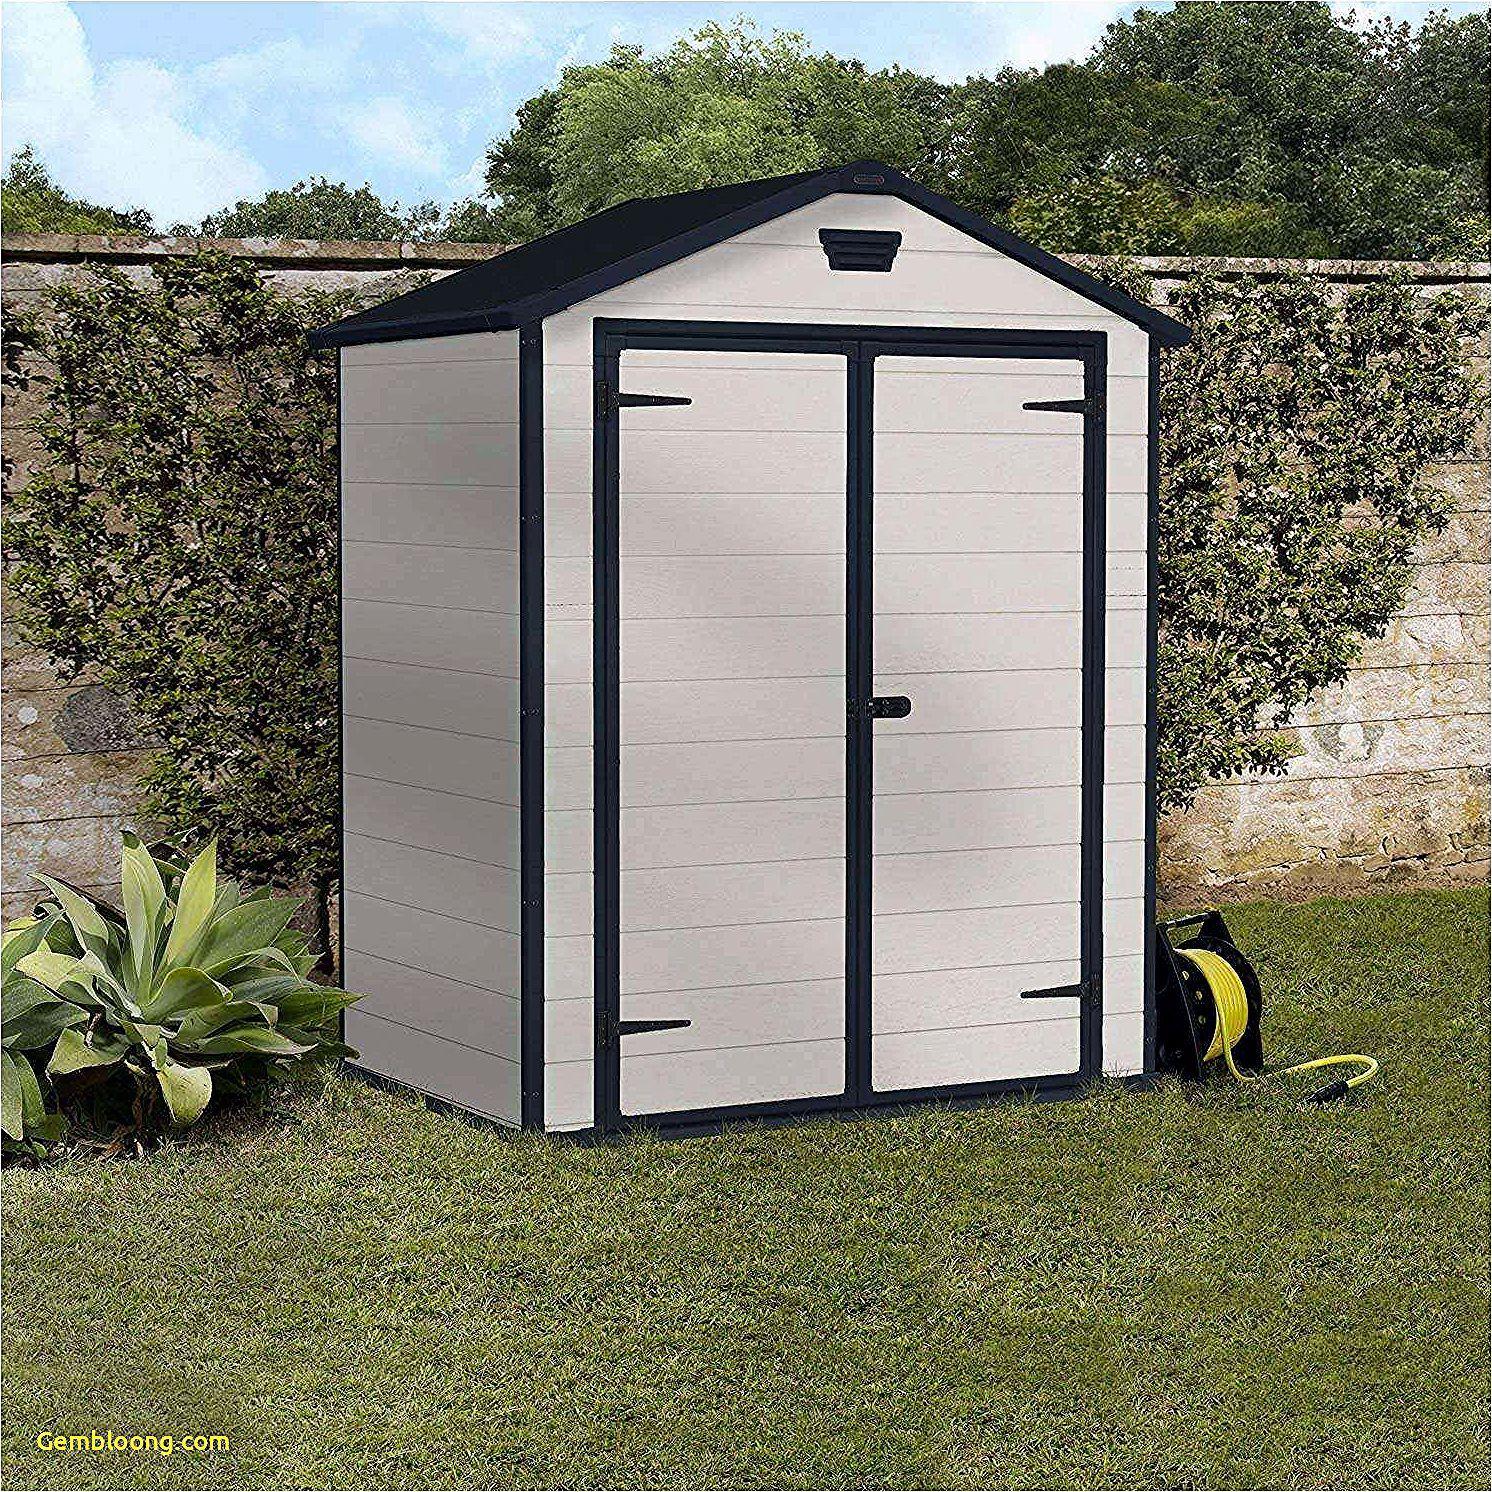 17 Fresh Abri De Jardin 10M2 | Indoor Garden, Outdoor ... destiné Abri De Jardin 10M2